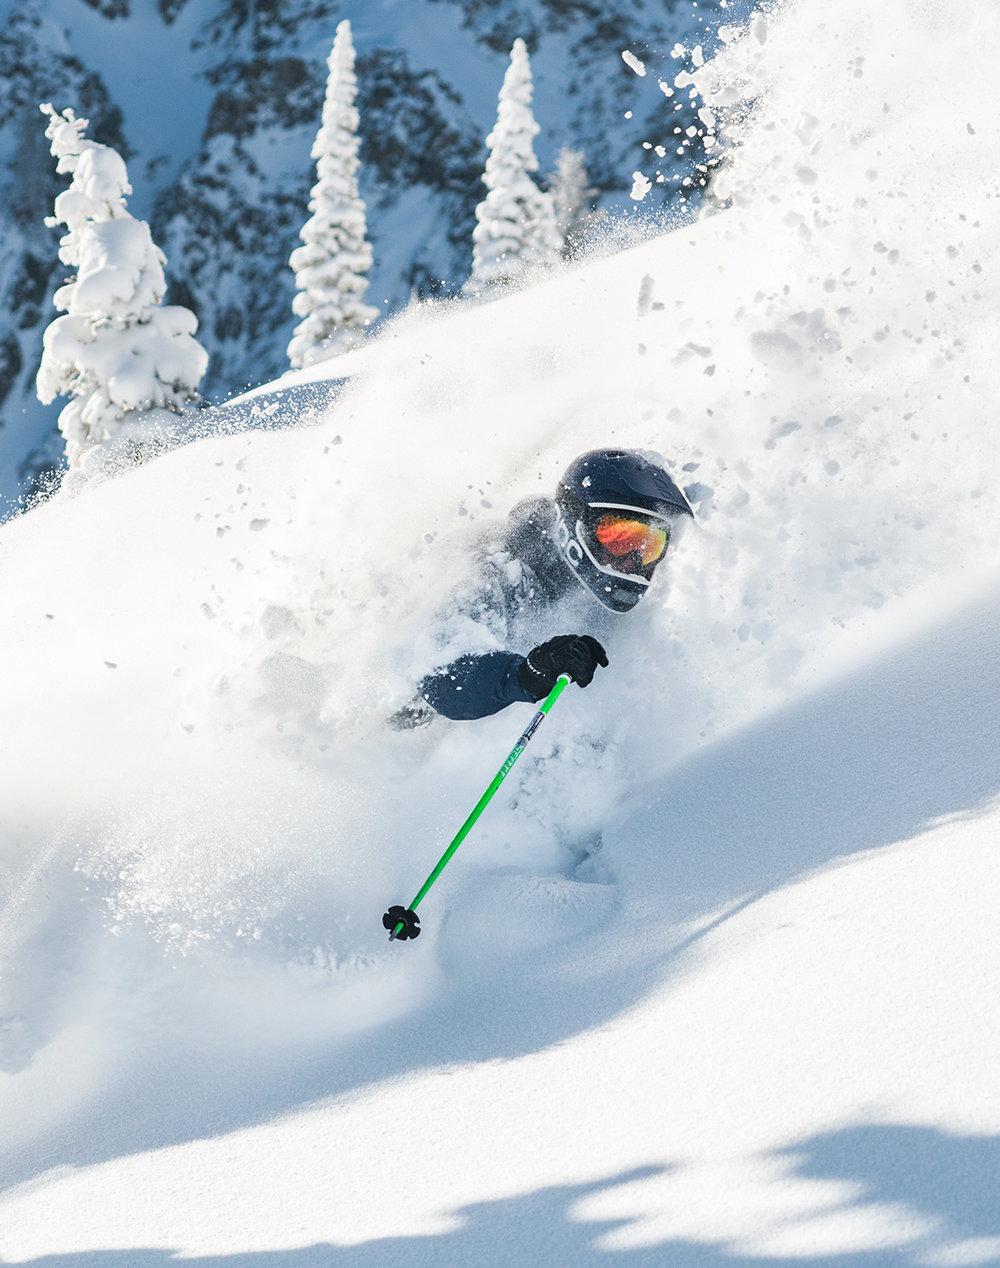 Lane_Peters_Multimedia_Skiing_Jack_Pilot.jpg